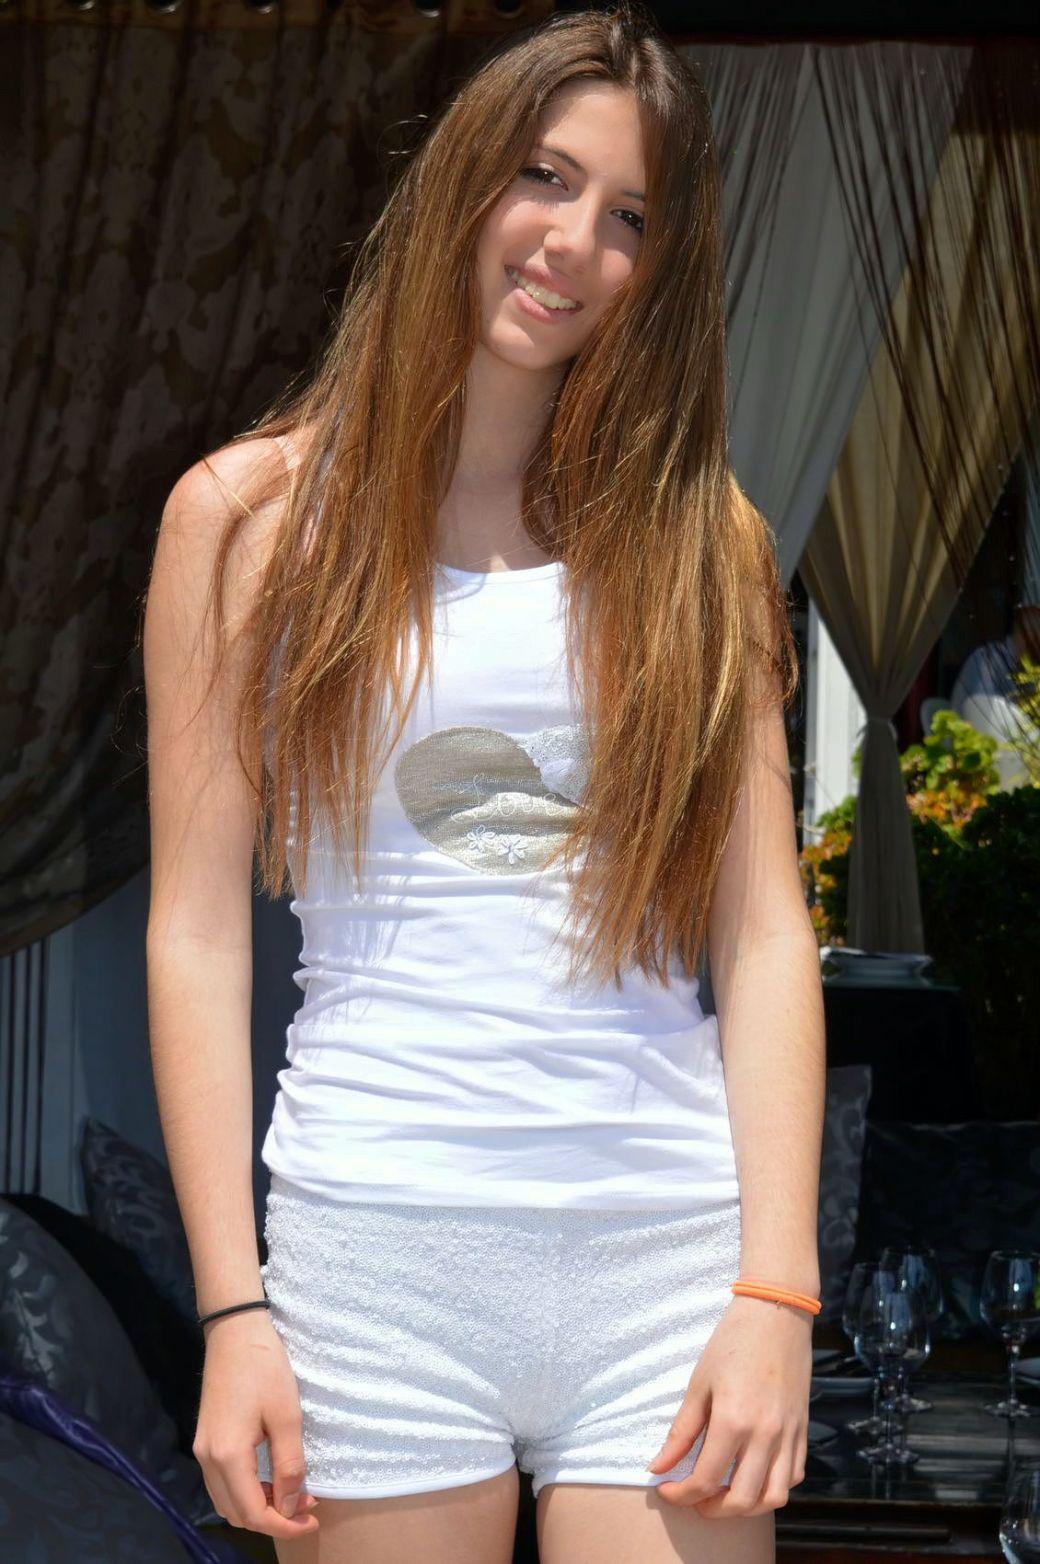 elisabeth puig begur tpl blog de moda infantil y juvenil (3)